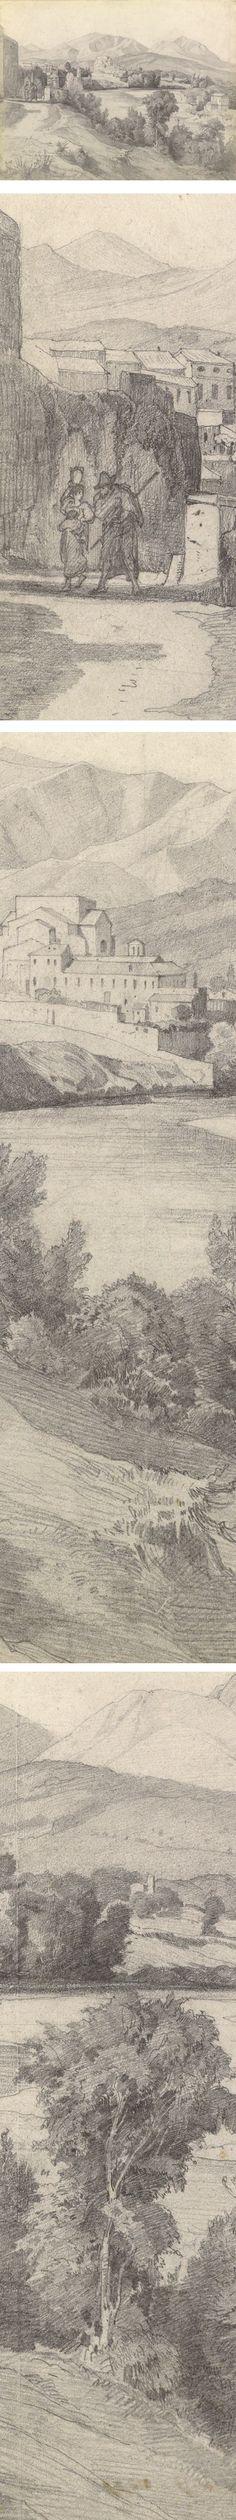 View of Benevento (Pencil), Edmund Kanoldt - Via Lines and Colors